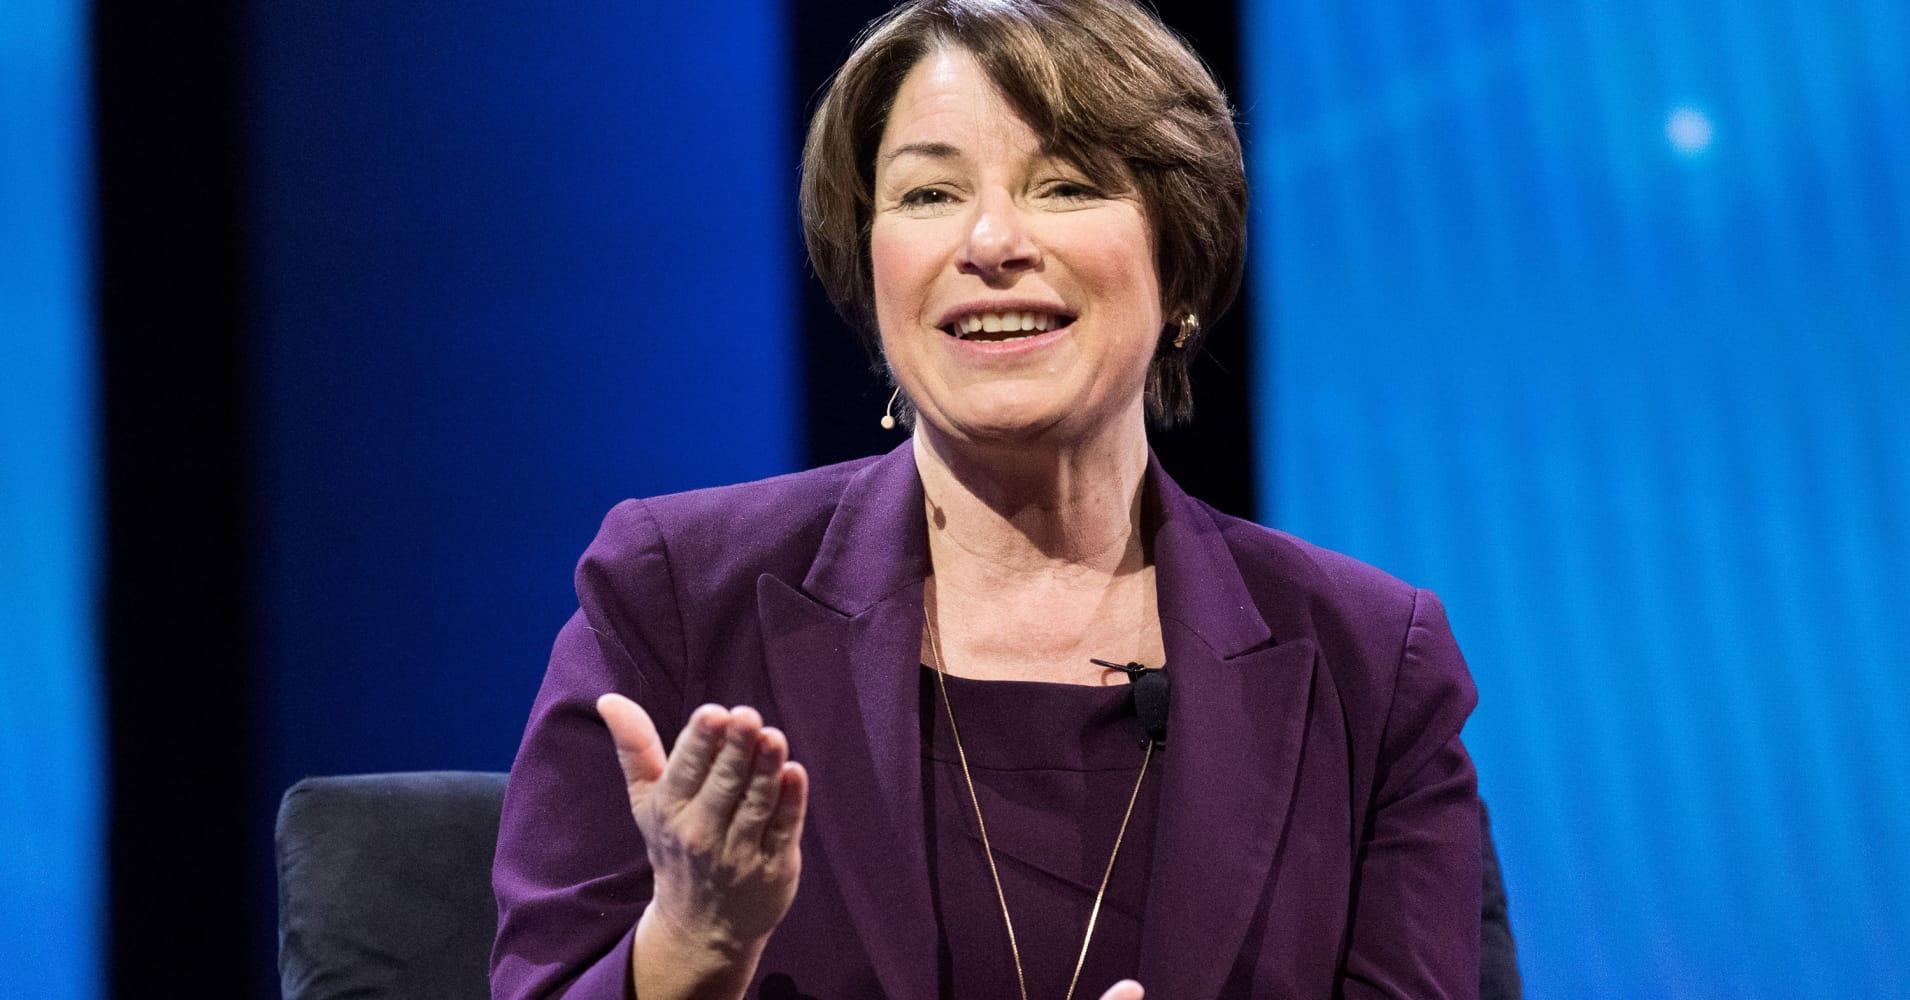 Minnesota Democrat Amy Klobuchar declares bid for 2020 presidential nomination